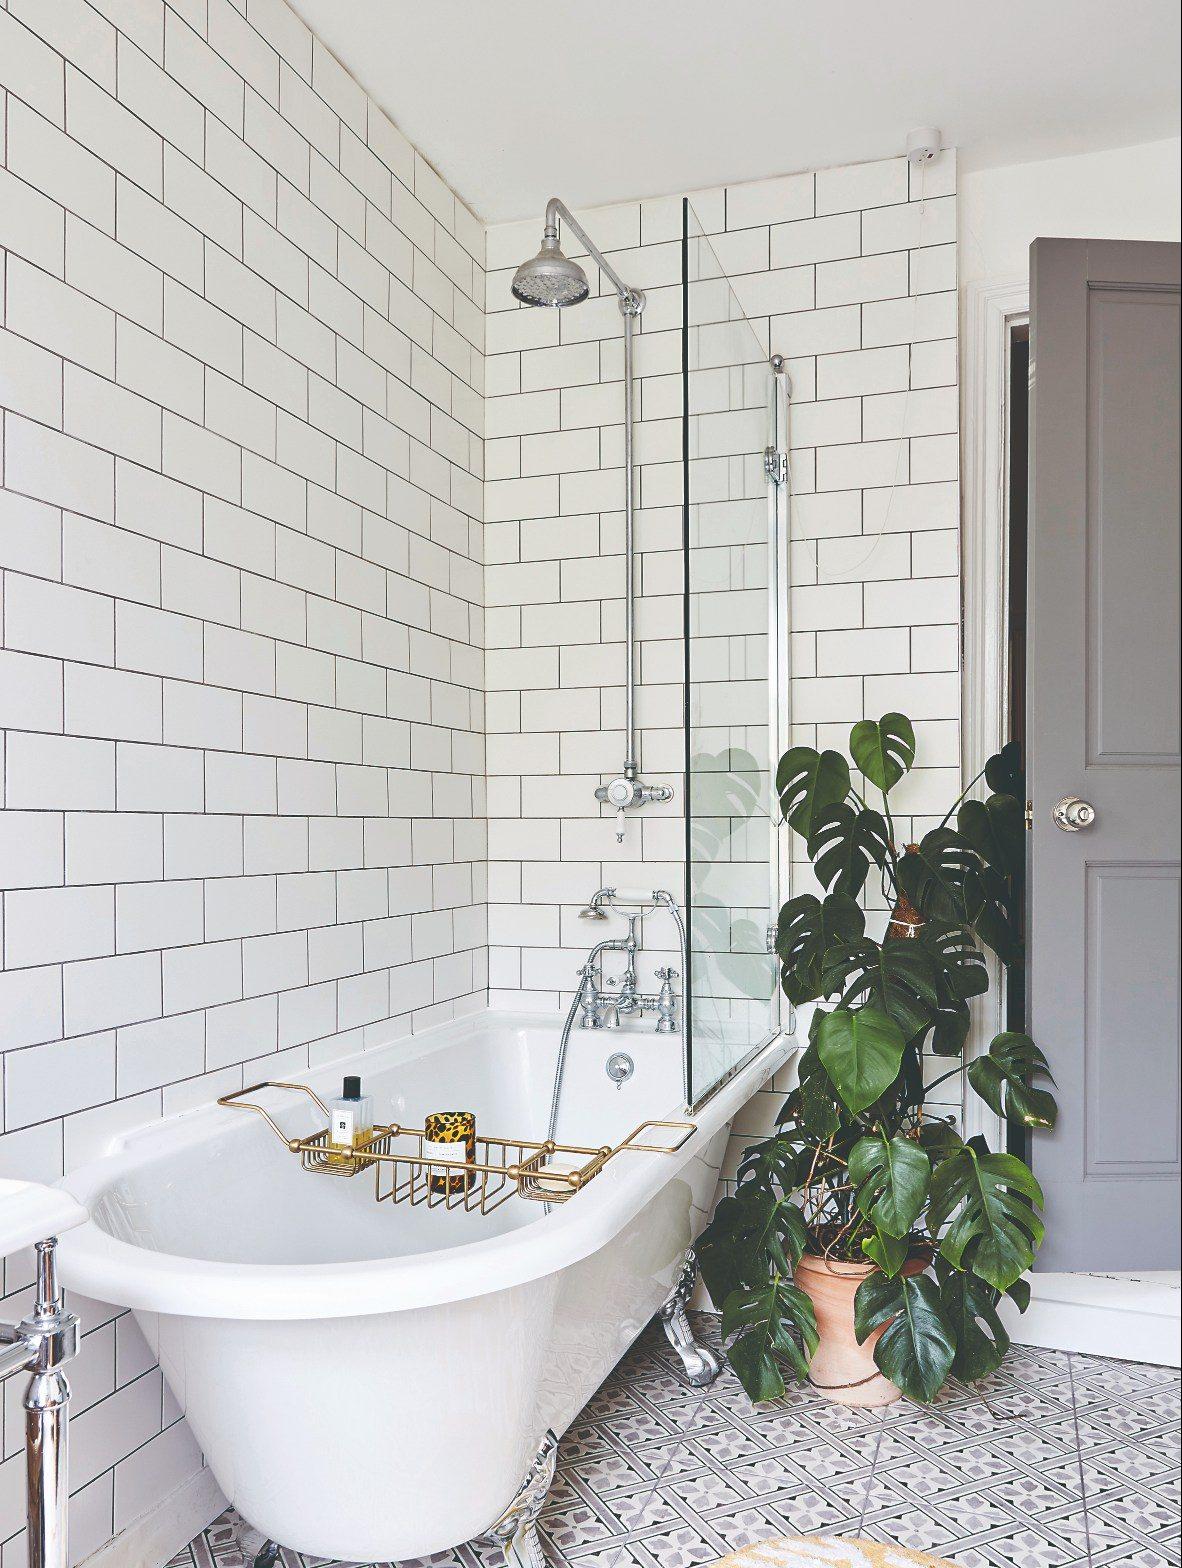 kúpeľňa s vaňou a bielymi obkladačkami